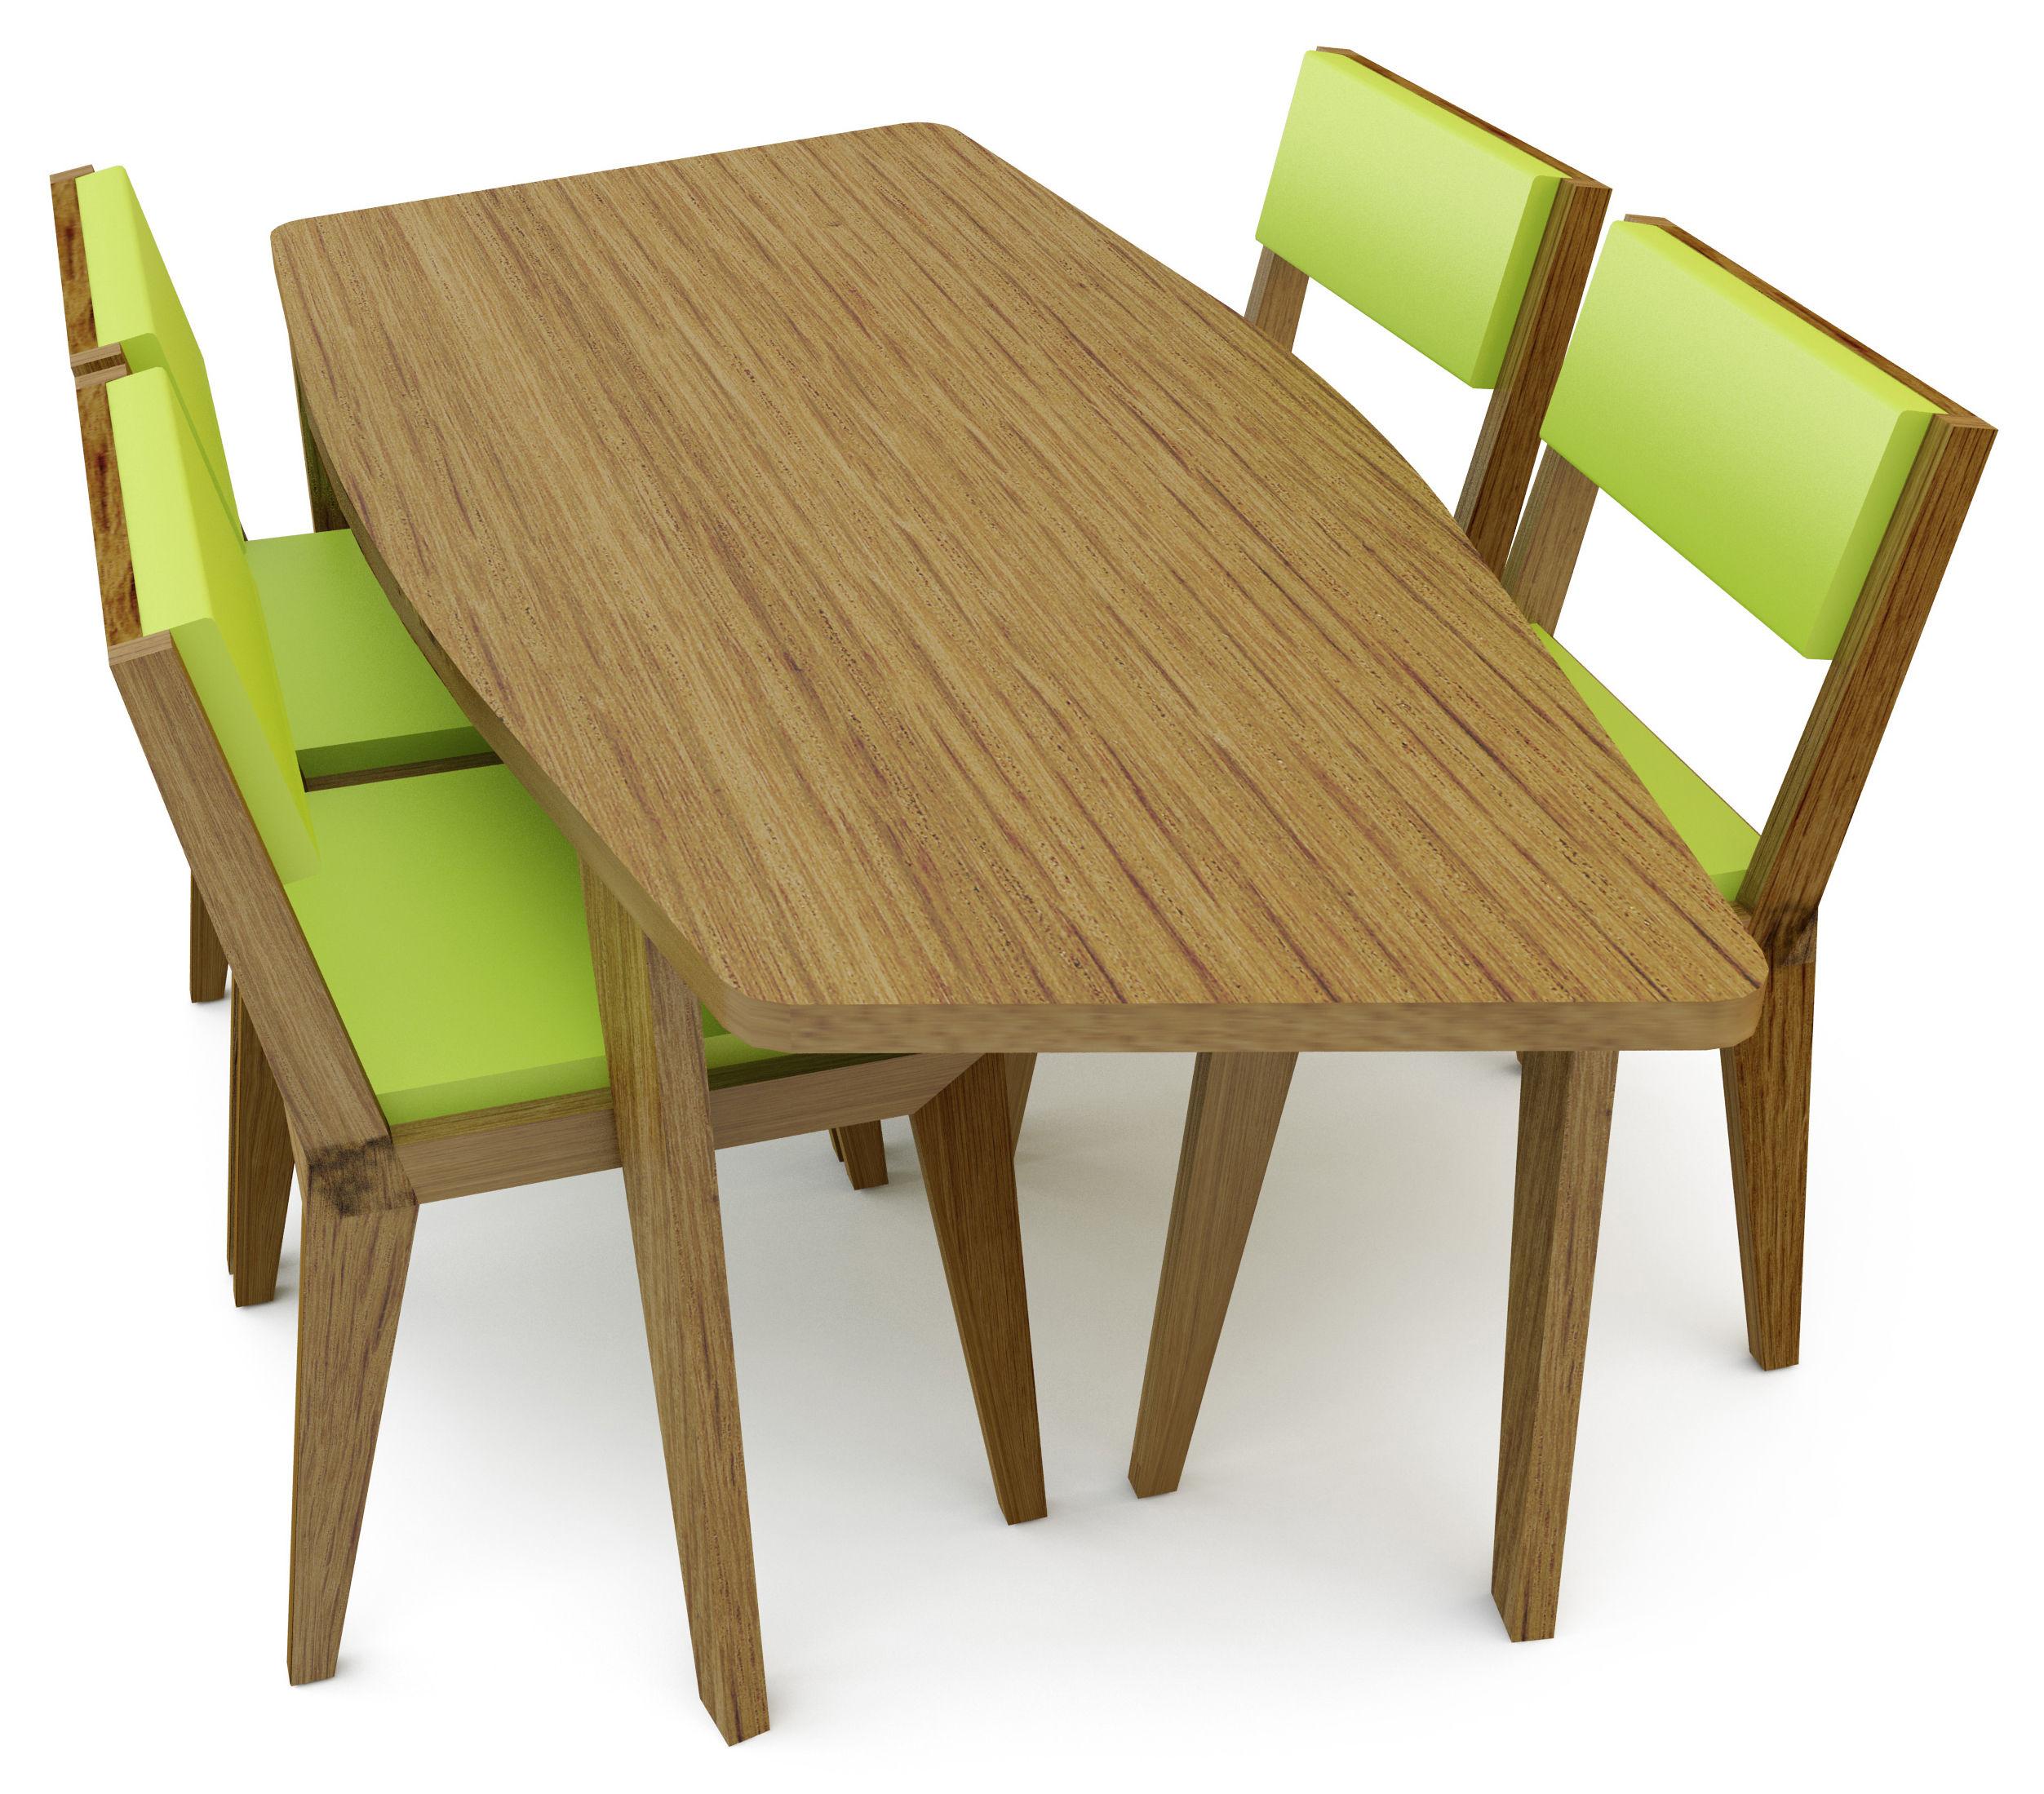 table room 26 large 300 x 109 cm ch ne 300 x 109 cm quinze milan. Black Bedroom Furniture Sets. Home Design Ideas